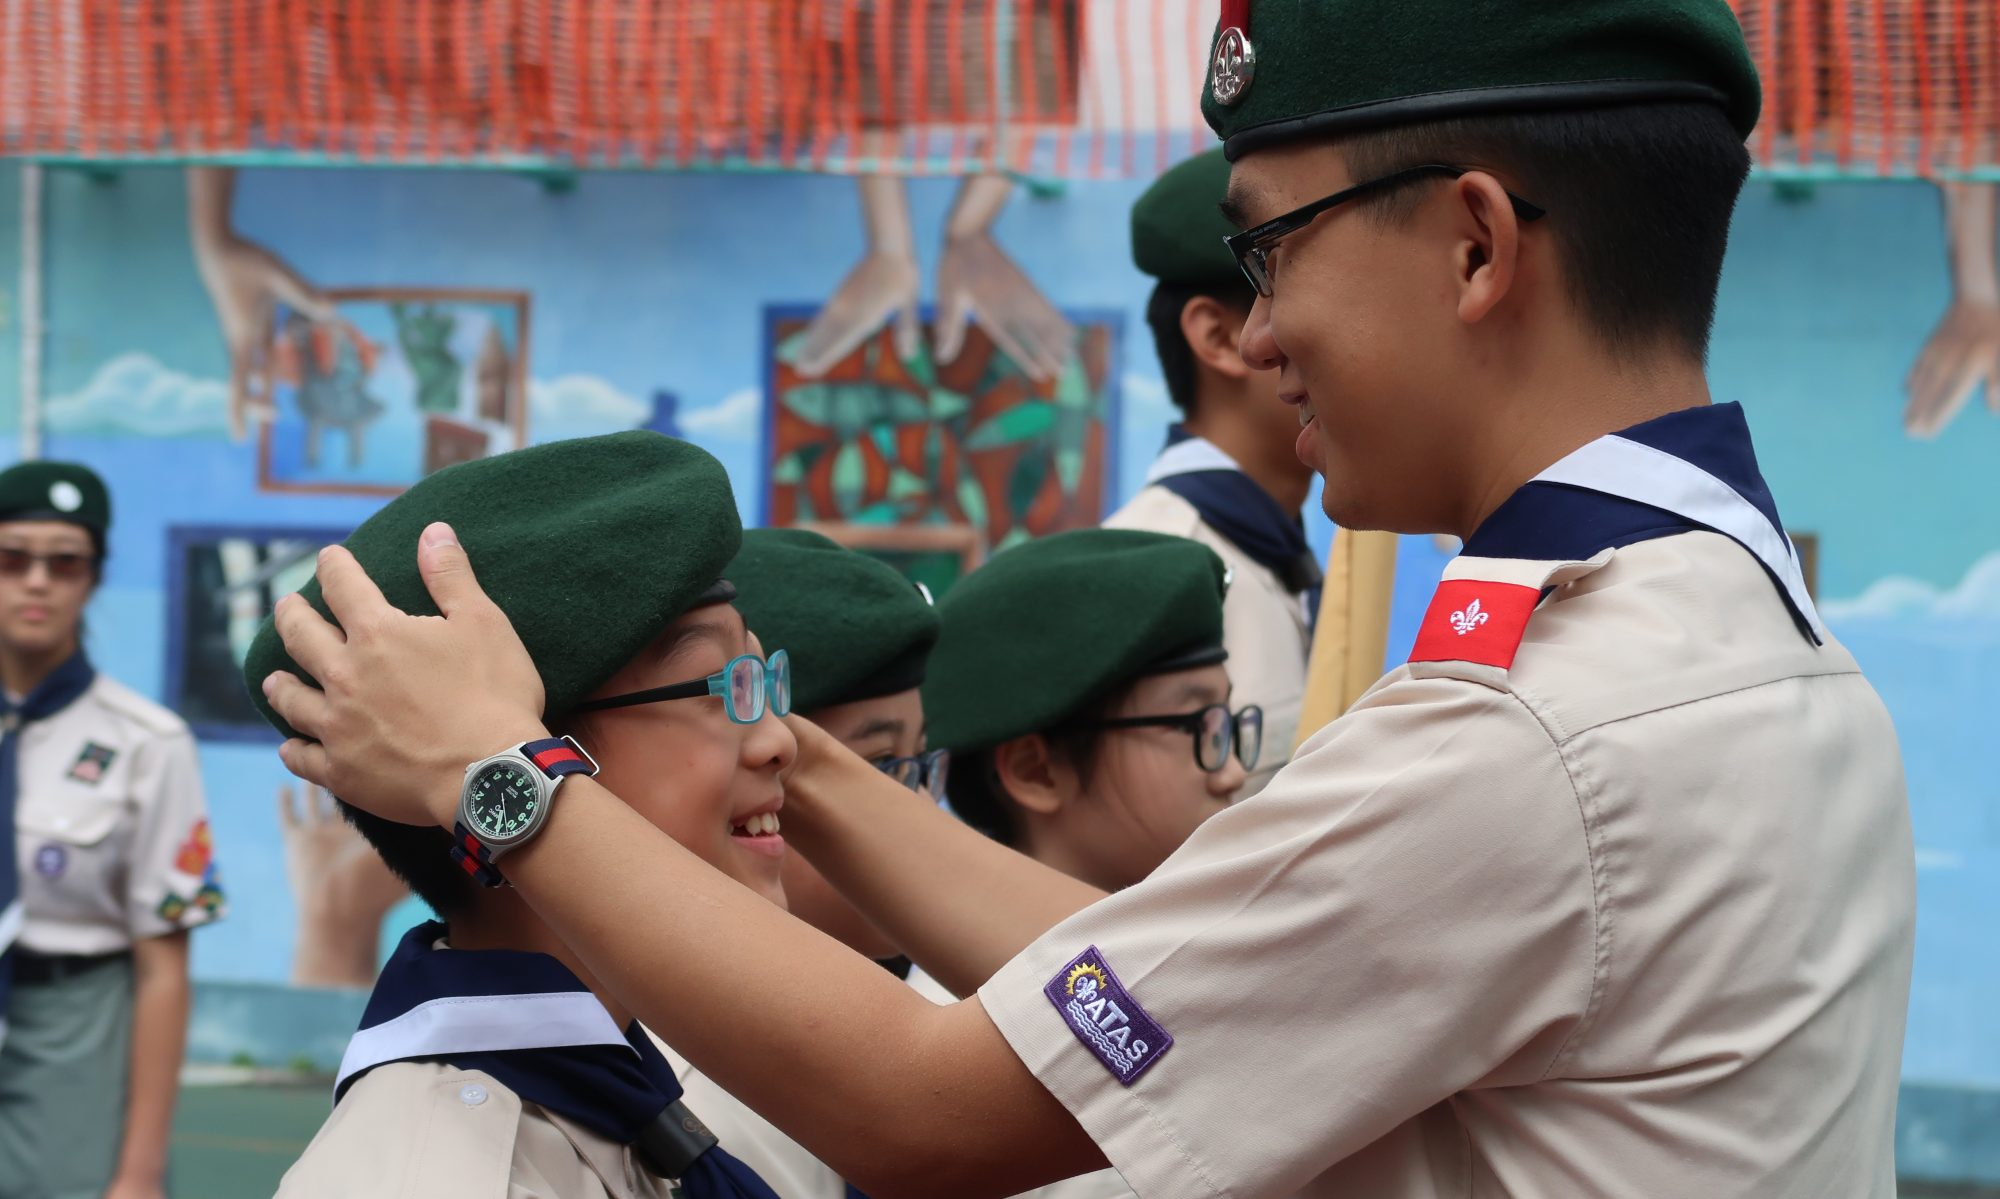 沙田西第二十旅 20th Scout Shatin west Group